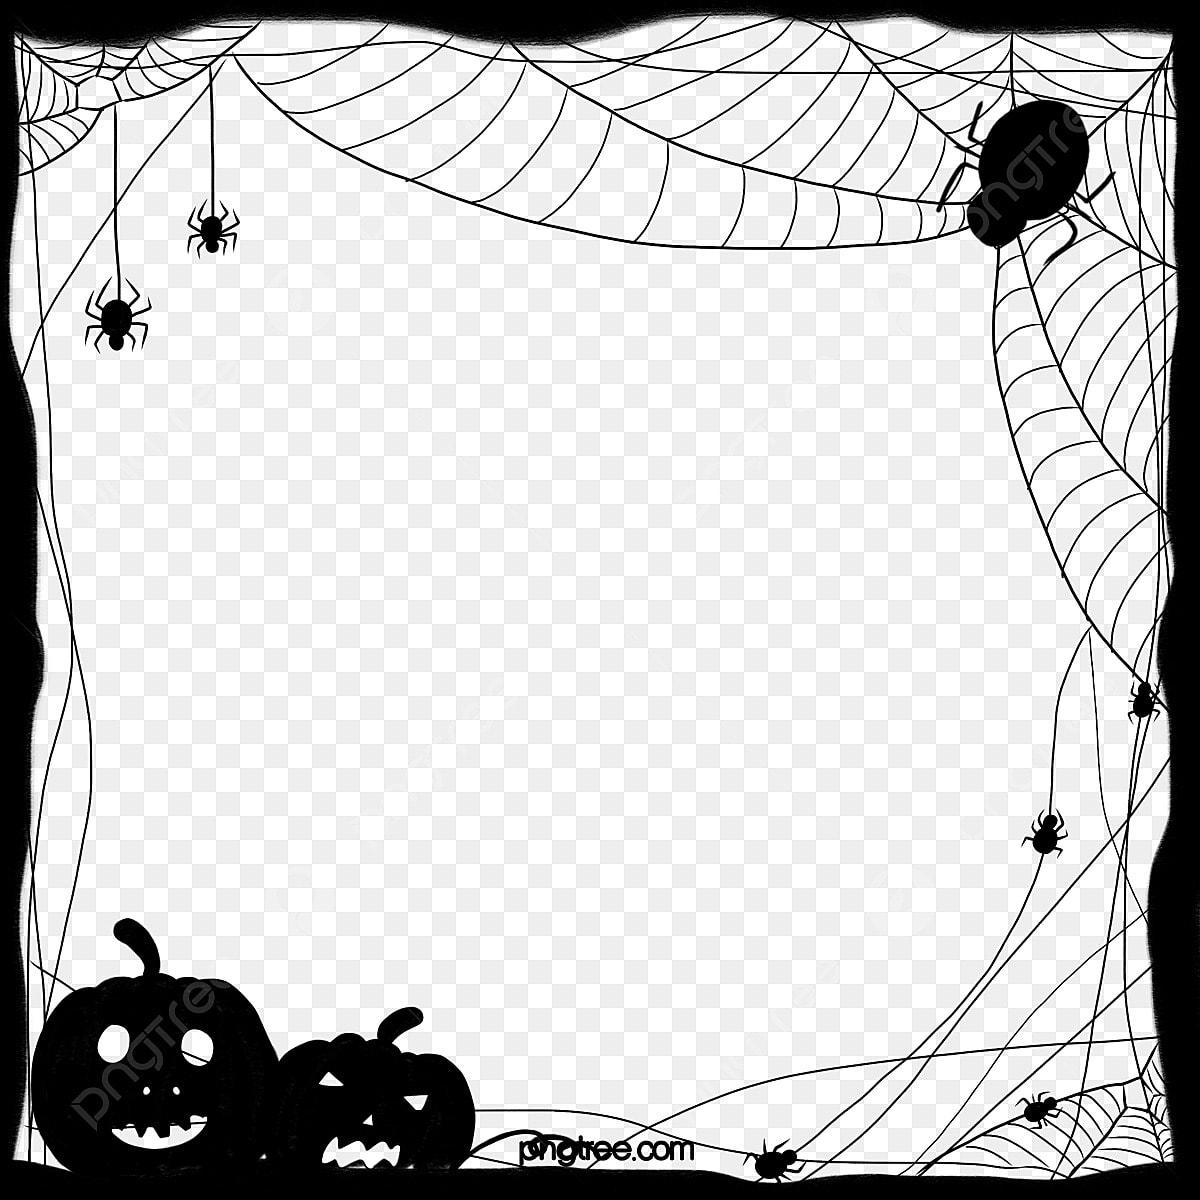 Halloween Black Pumpkin Spider Border, Halloween, Black, Terror ...